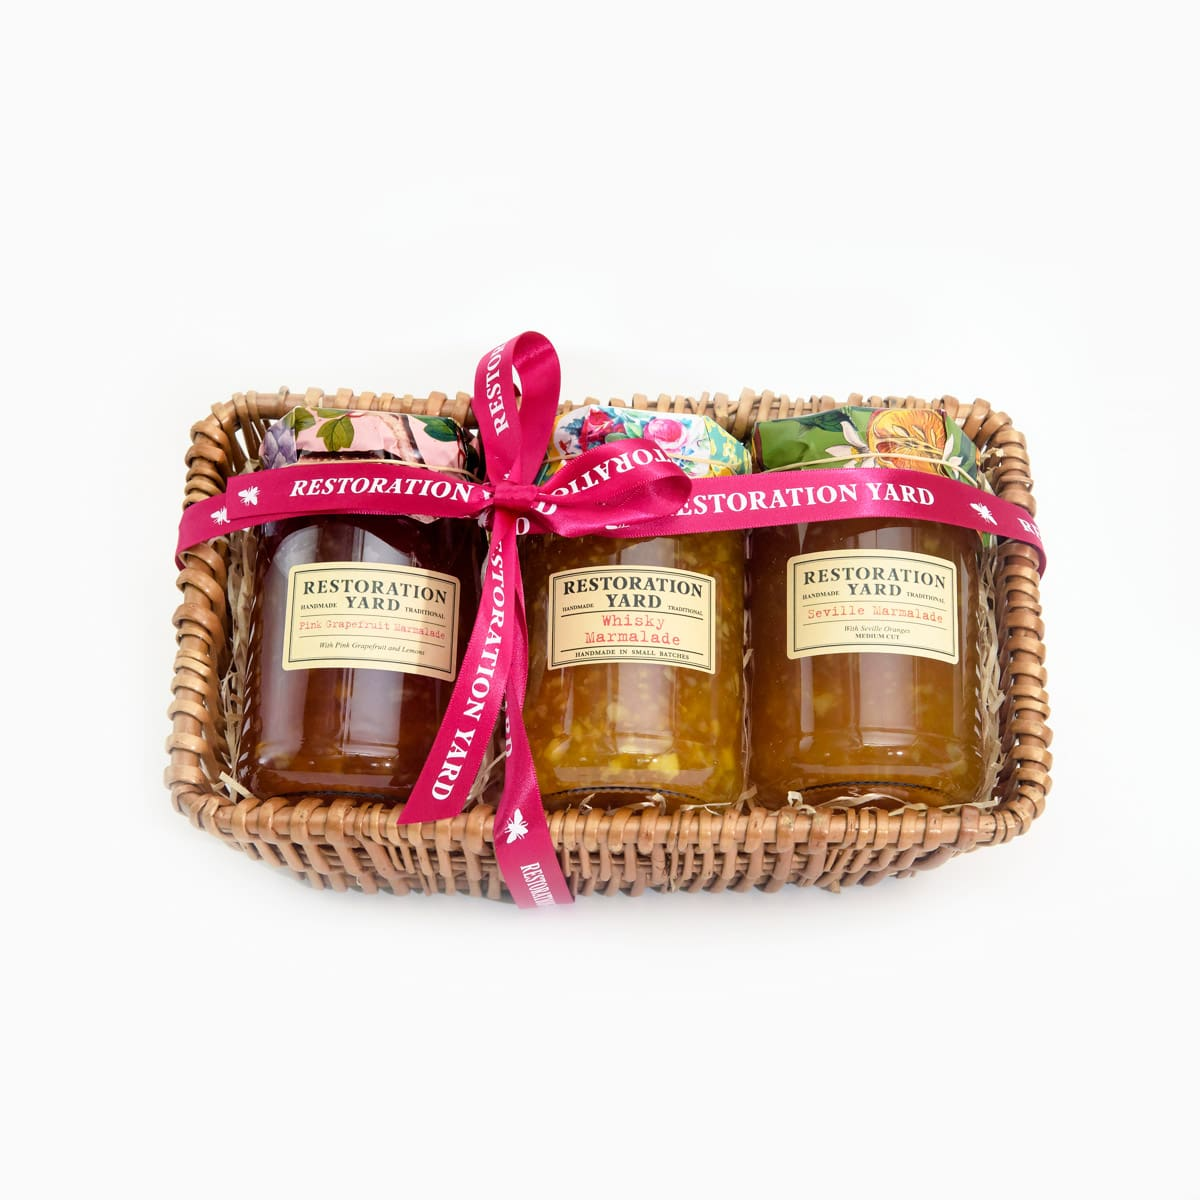 Trio Hampers Whisky Marmalade Pink Grapefruit Marmalade Seville Marmalade by Restoration Yard | Restoration Yard